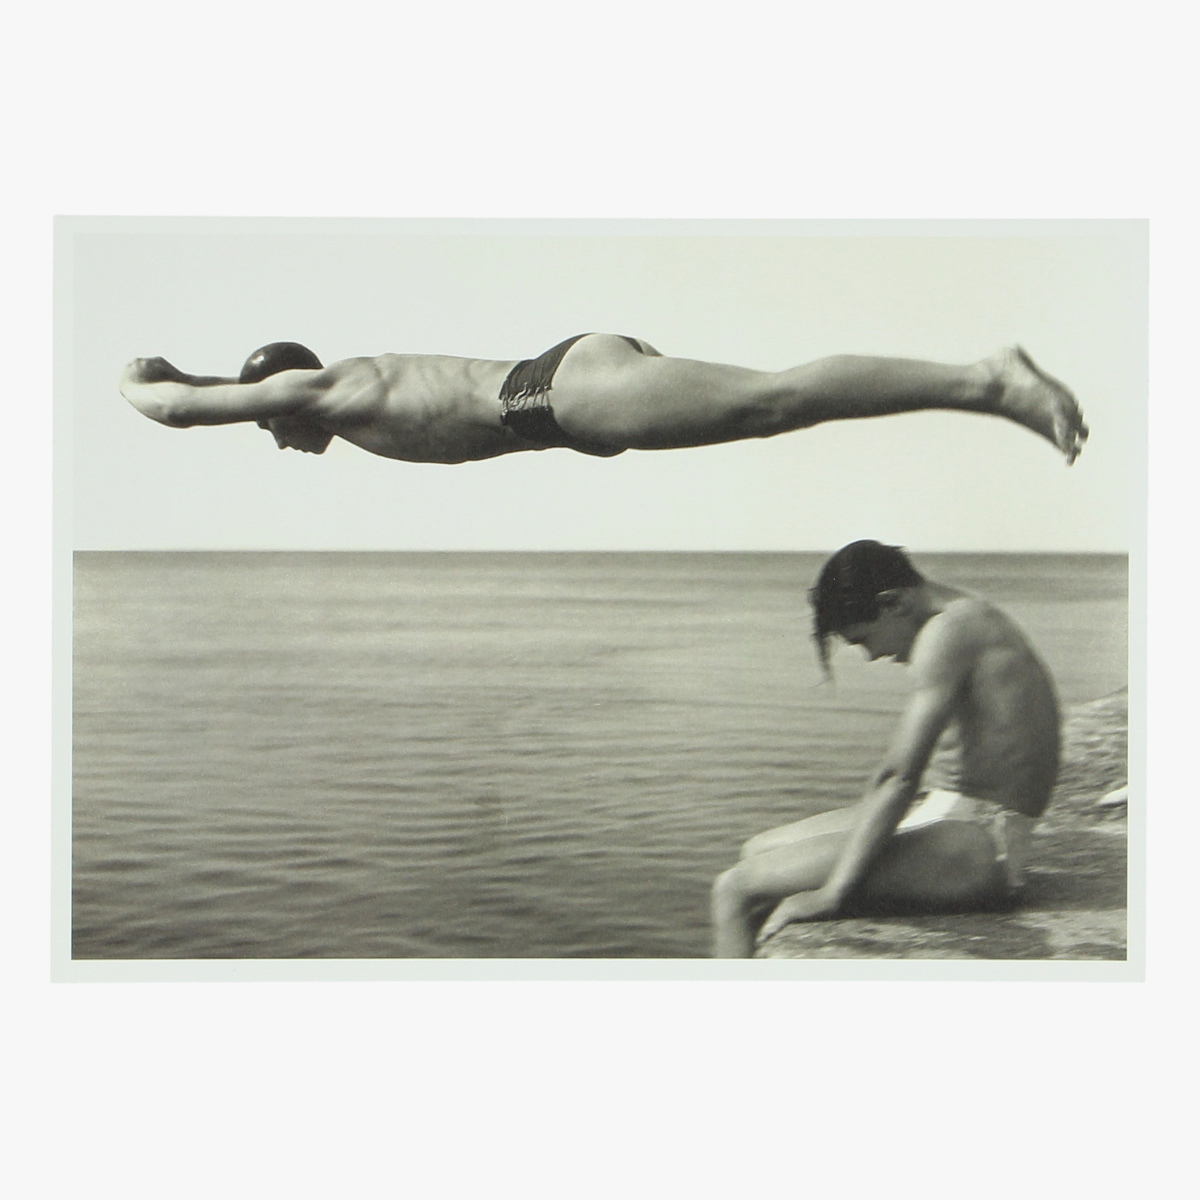 Afbeeldingen van postkaart Nino Migliori'' il tuffatore''1951